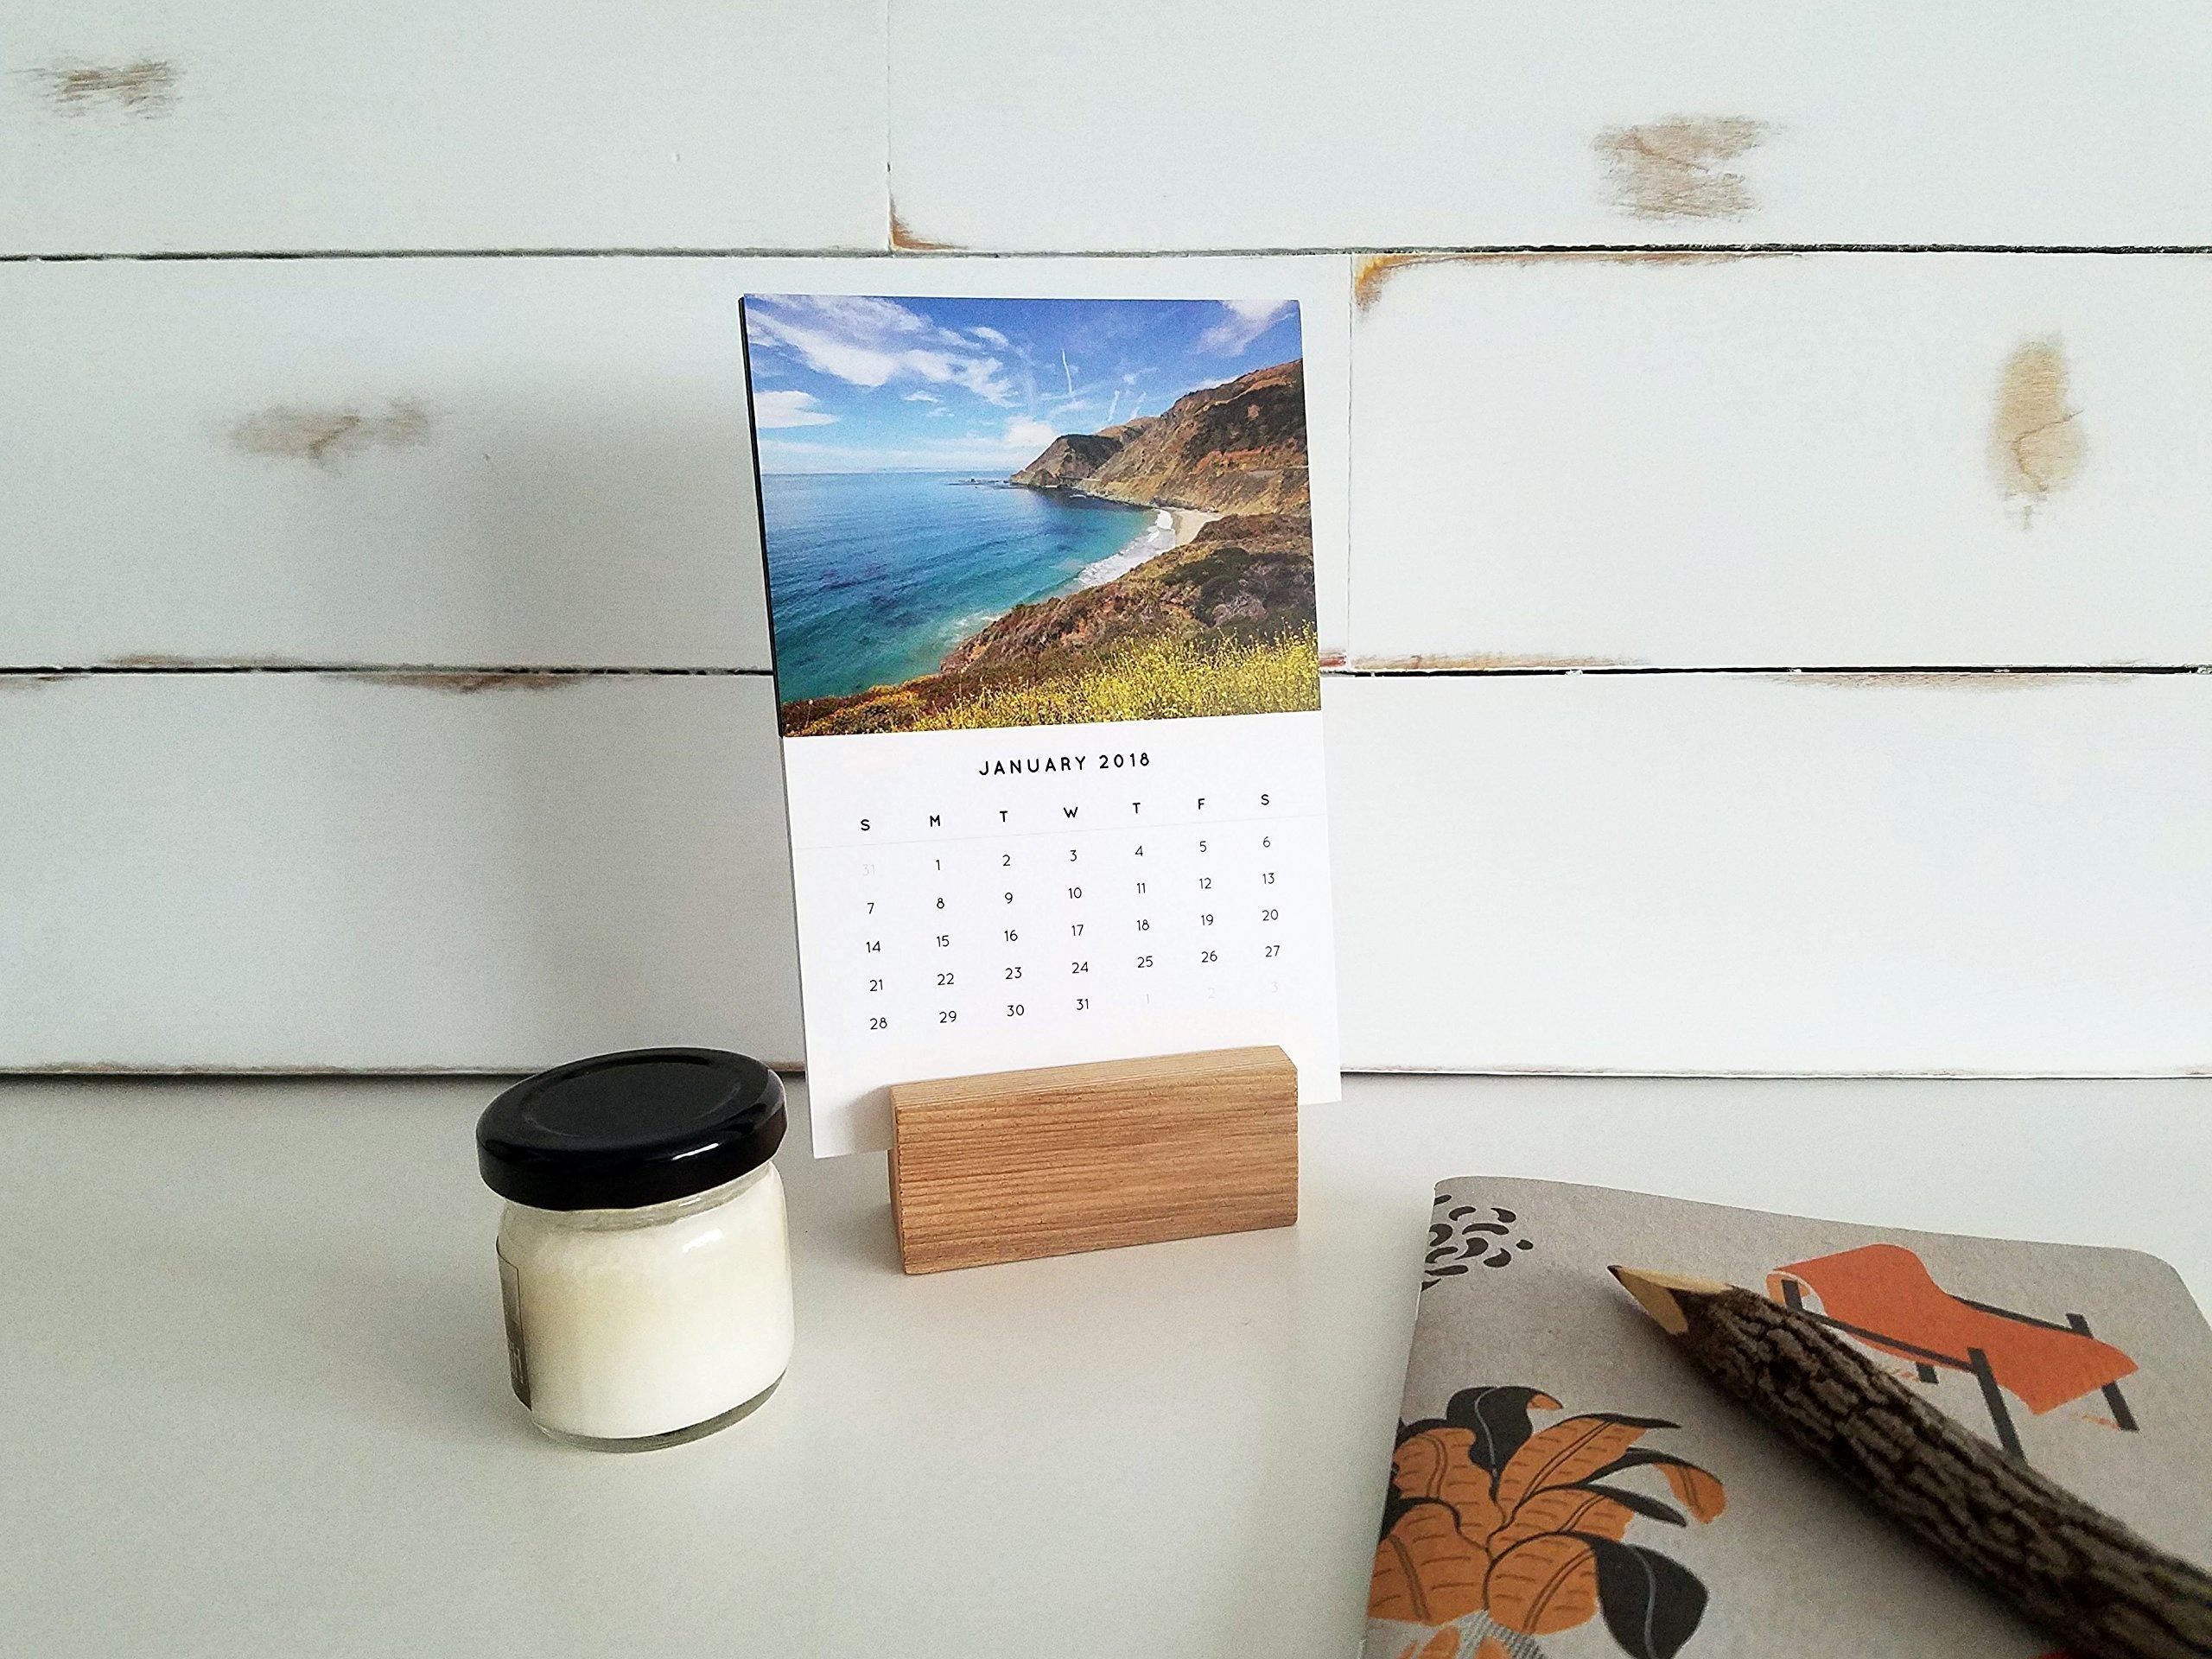 2018 Desktop Calendar with Wood Stand